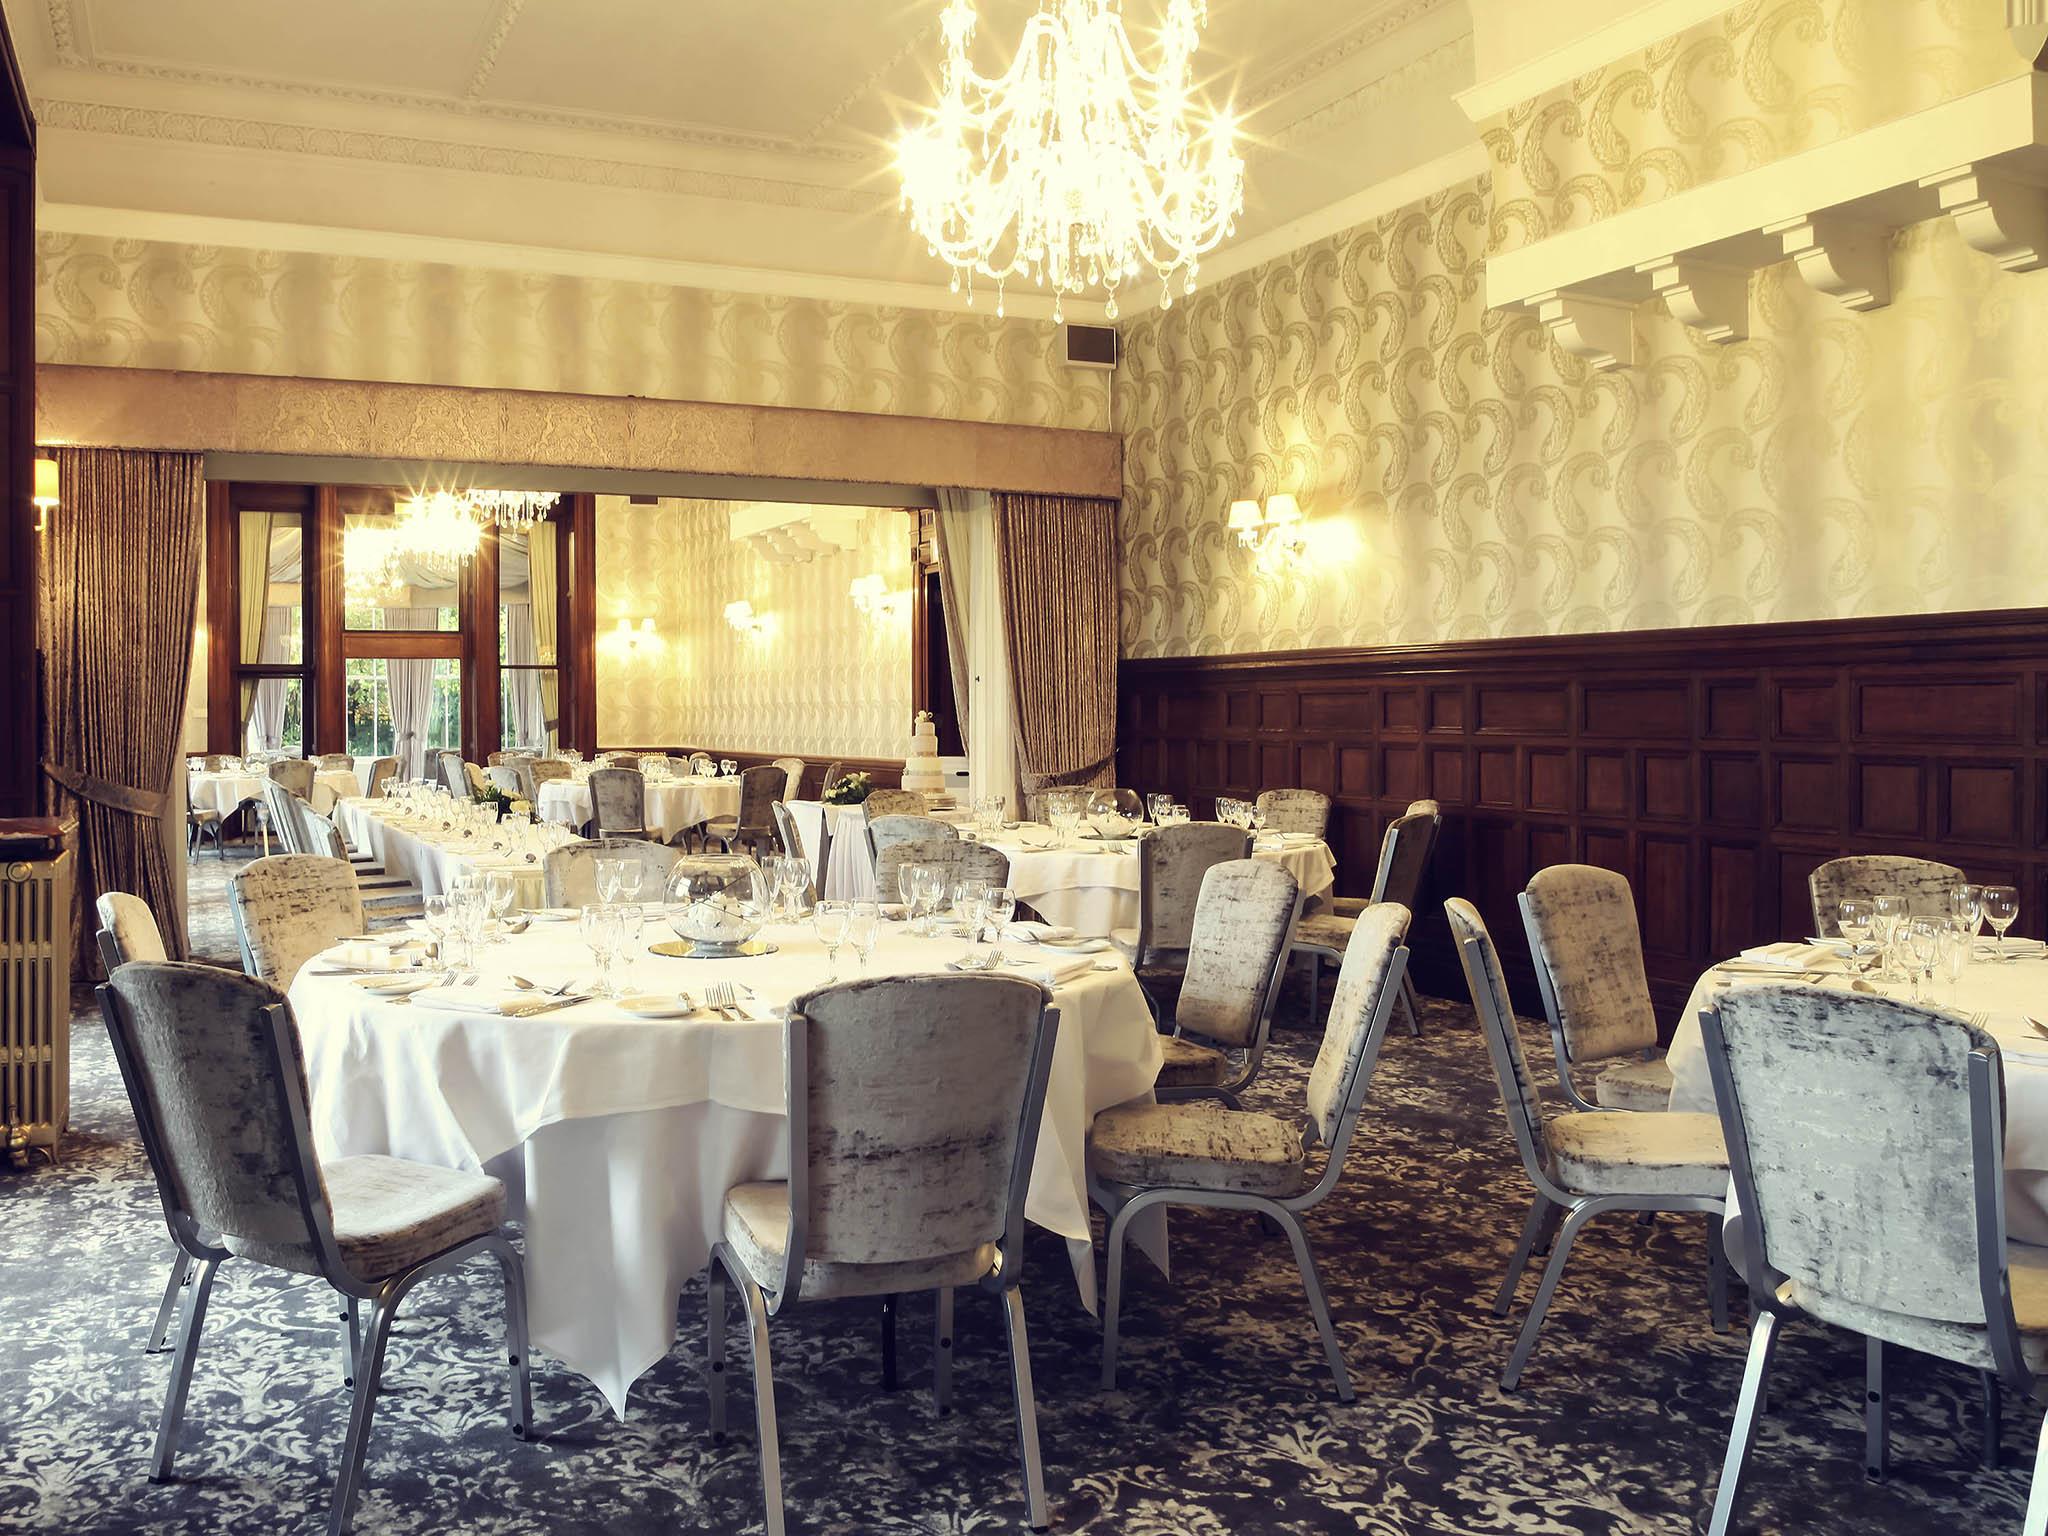 wedding chair covers burton on trent bean bag ikea mercure upon 4 star hotel in staffordshire weddings newton park